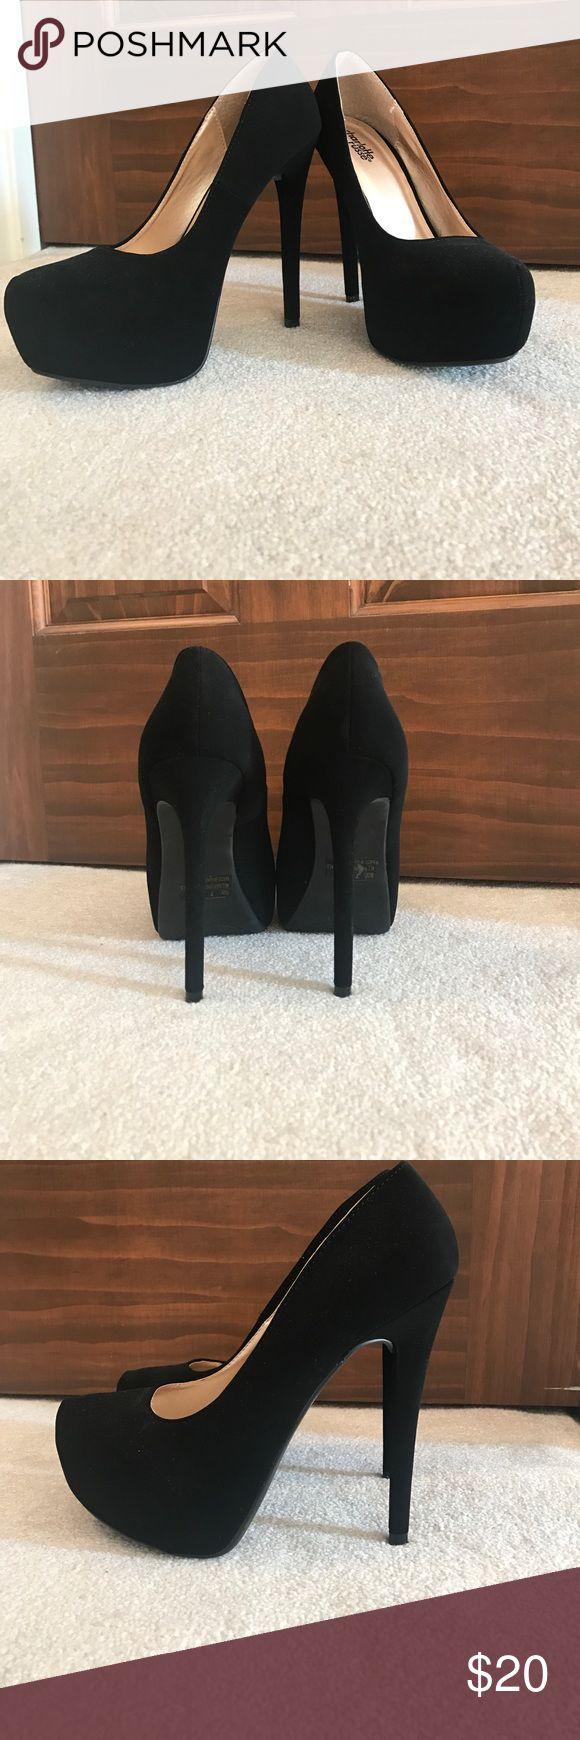 Black high heels Black high heels. NEVER BEEN WORN Charlotte Russe Shoes Heels